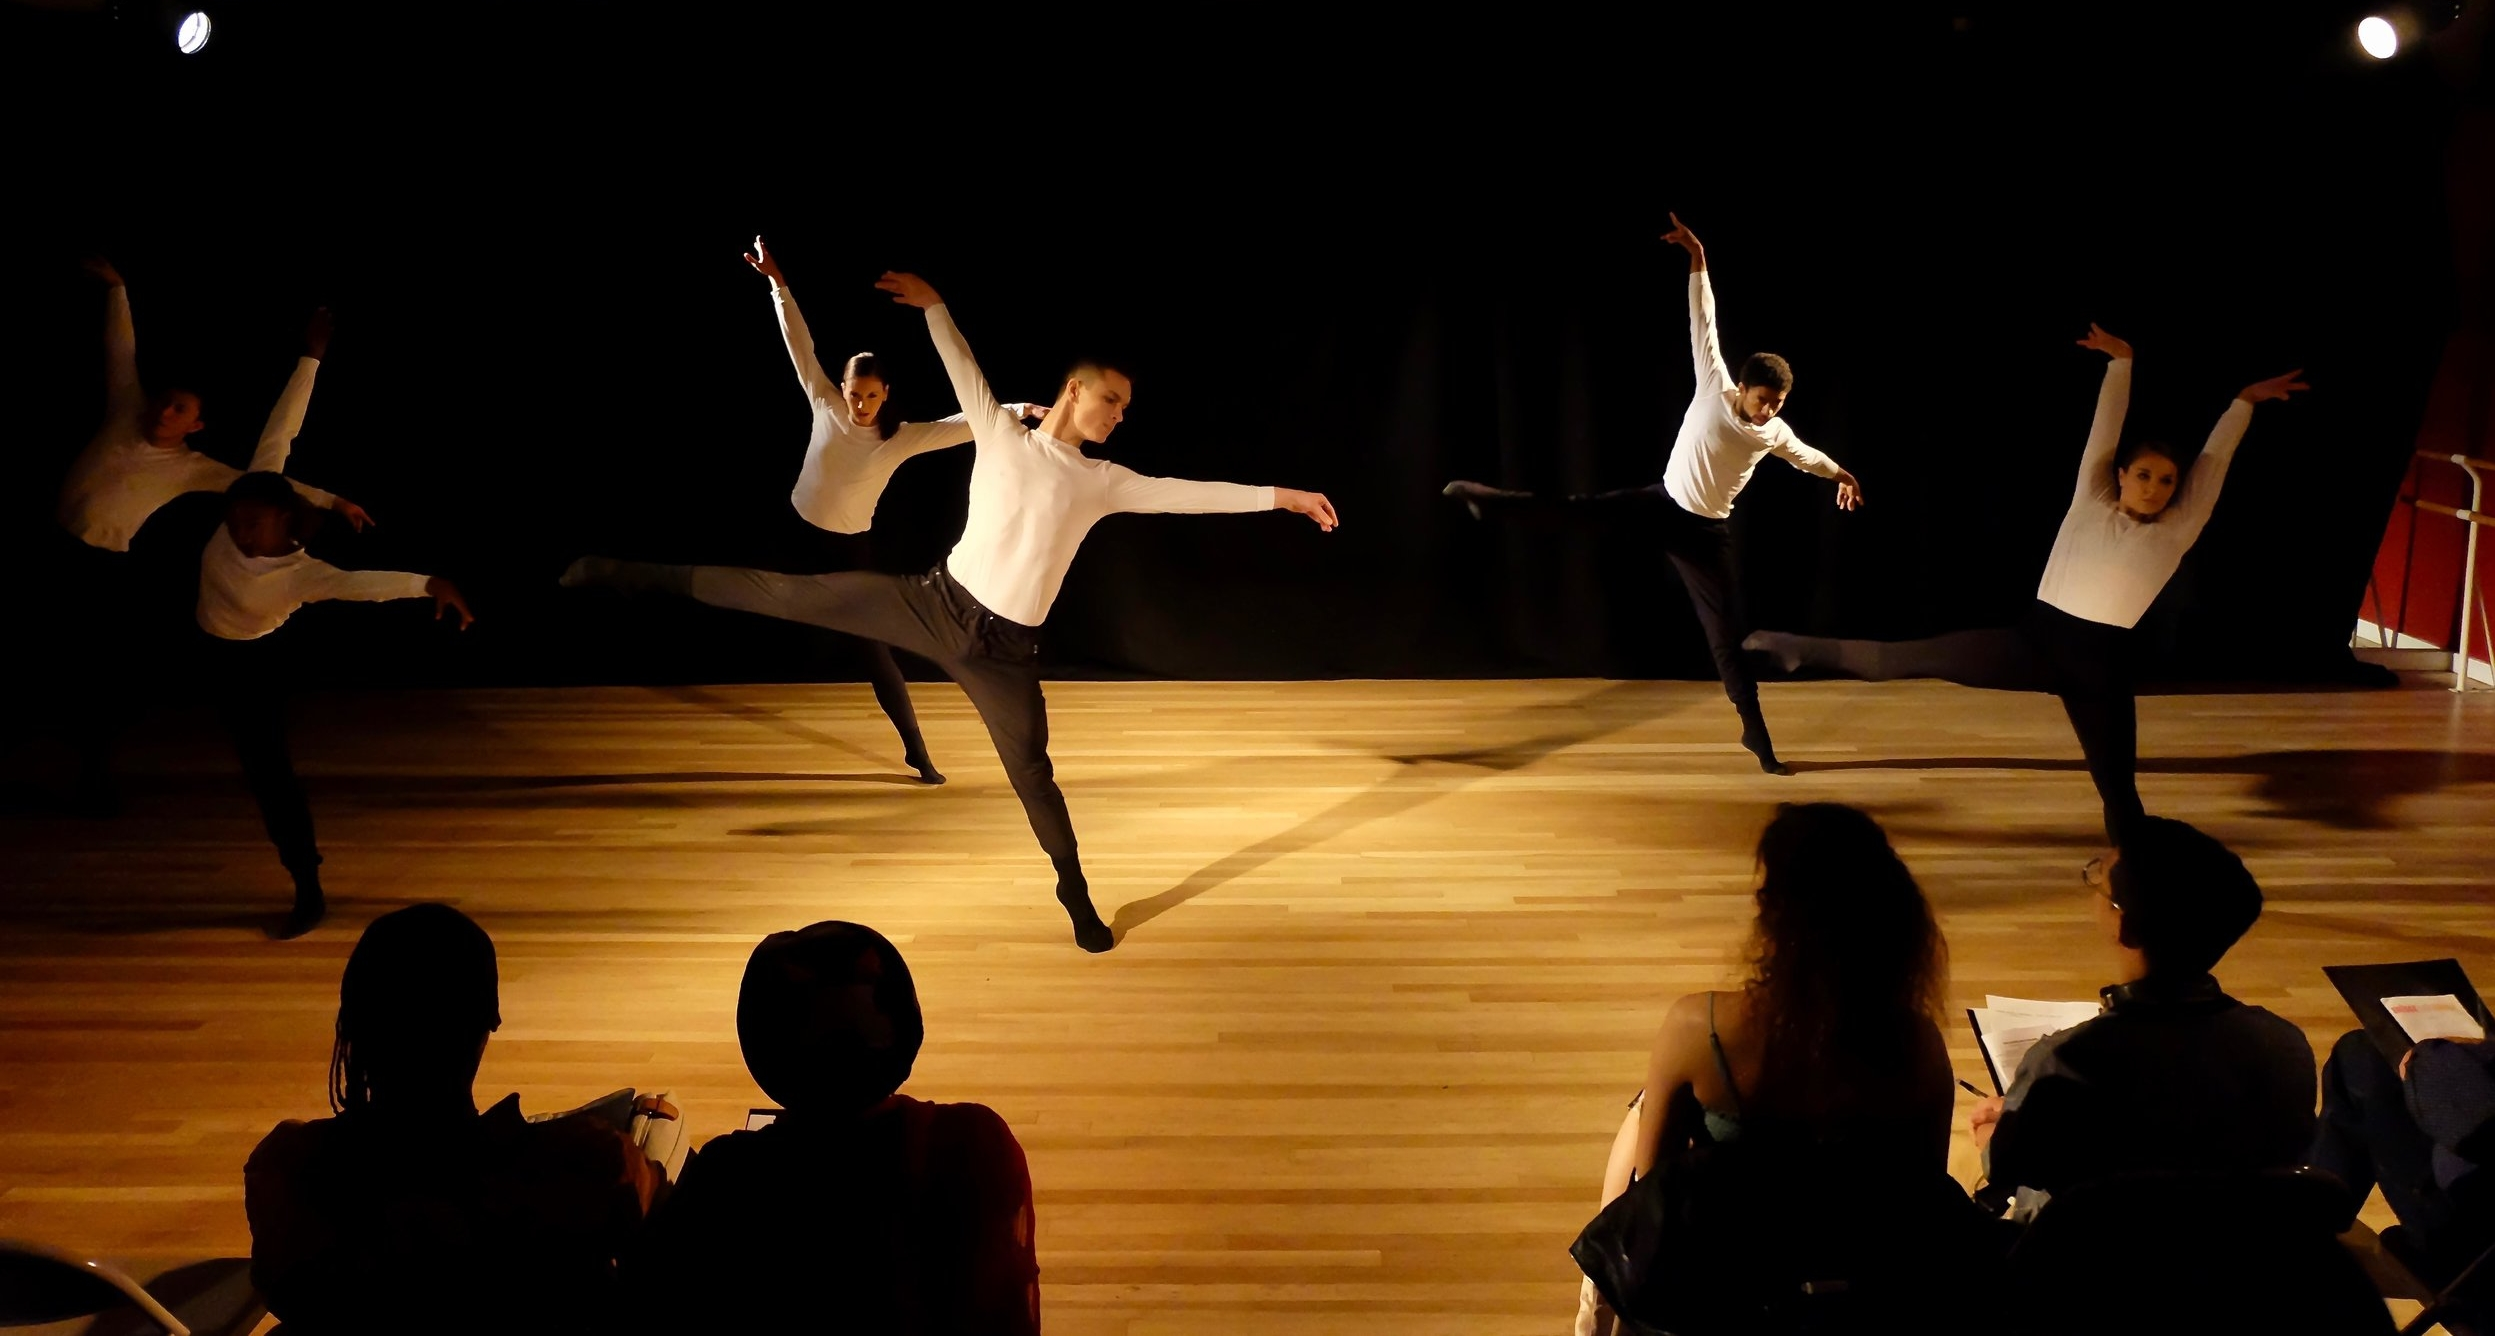 Choreographer:    Giacomo Severini Bonazelli     Dancers:    Alexander Hroshenko, Brittany Thomson, EvanMatthew Stewart, Hannah Russell, Paulo Gutierrez, and Sequoia Harris      Photo by Alexzandra Knapp